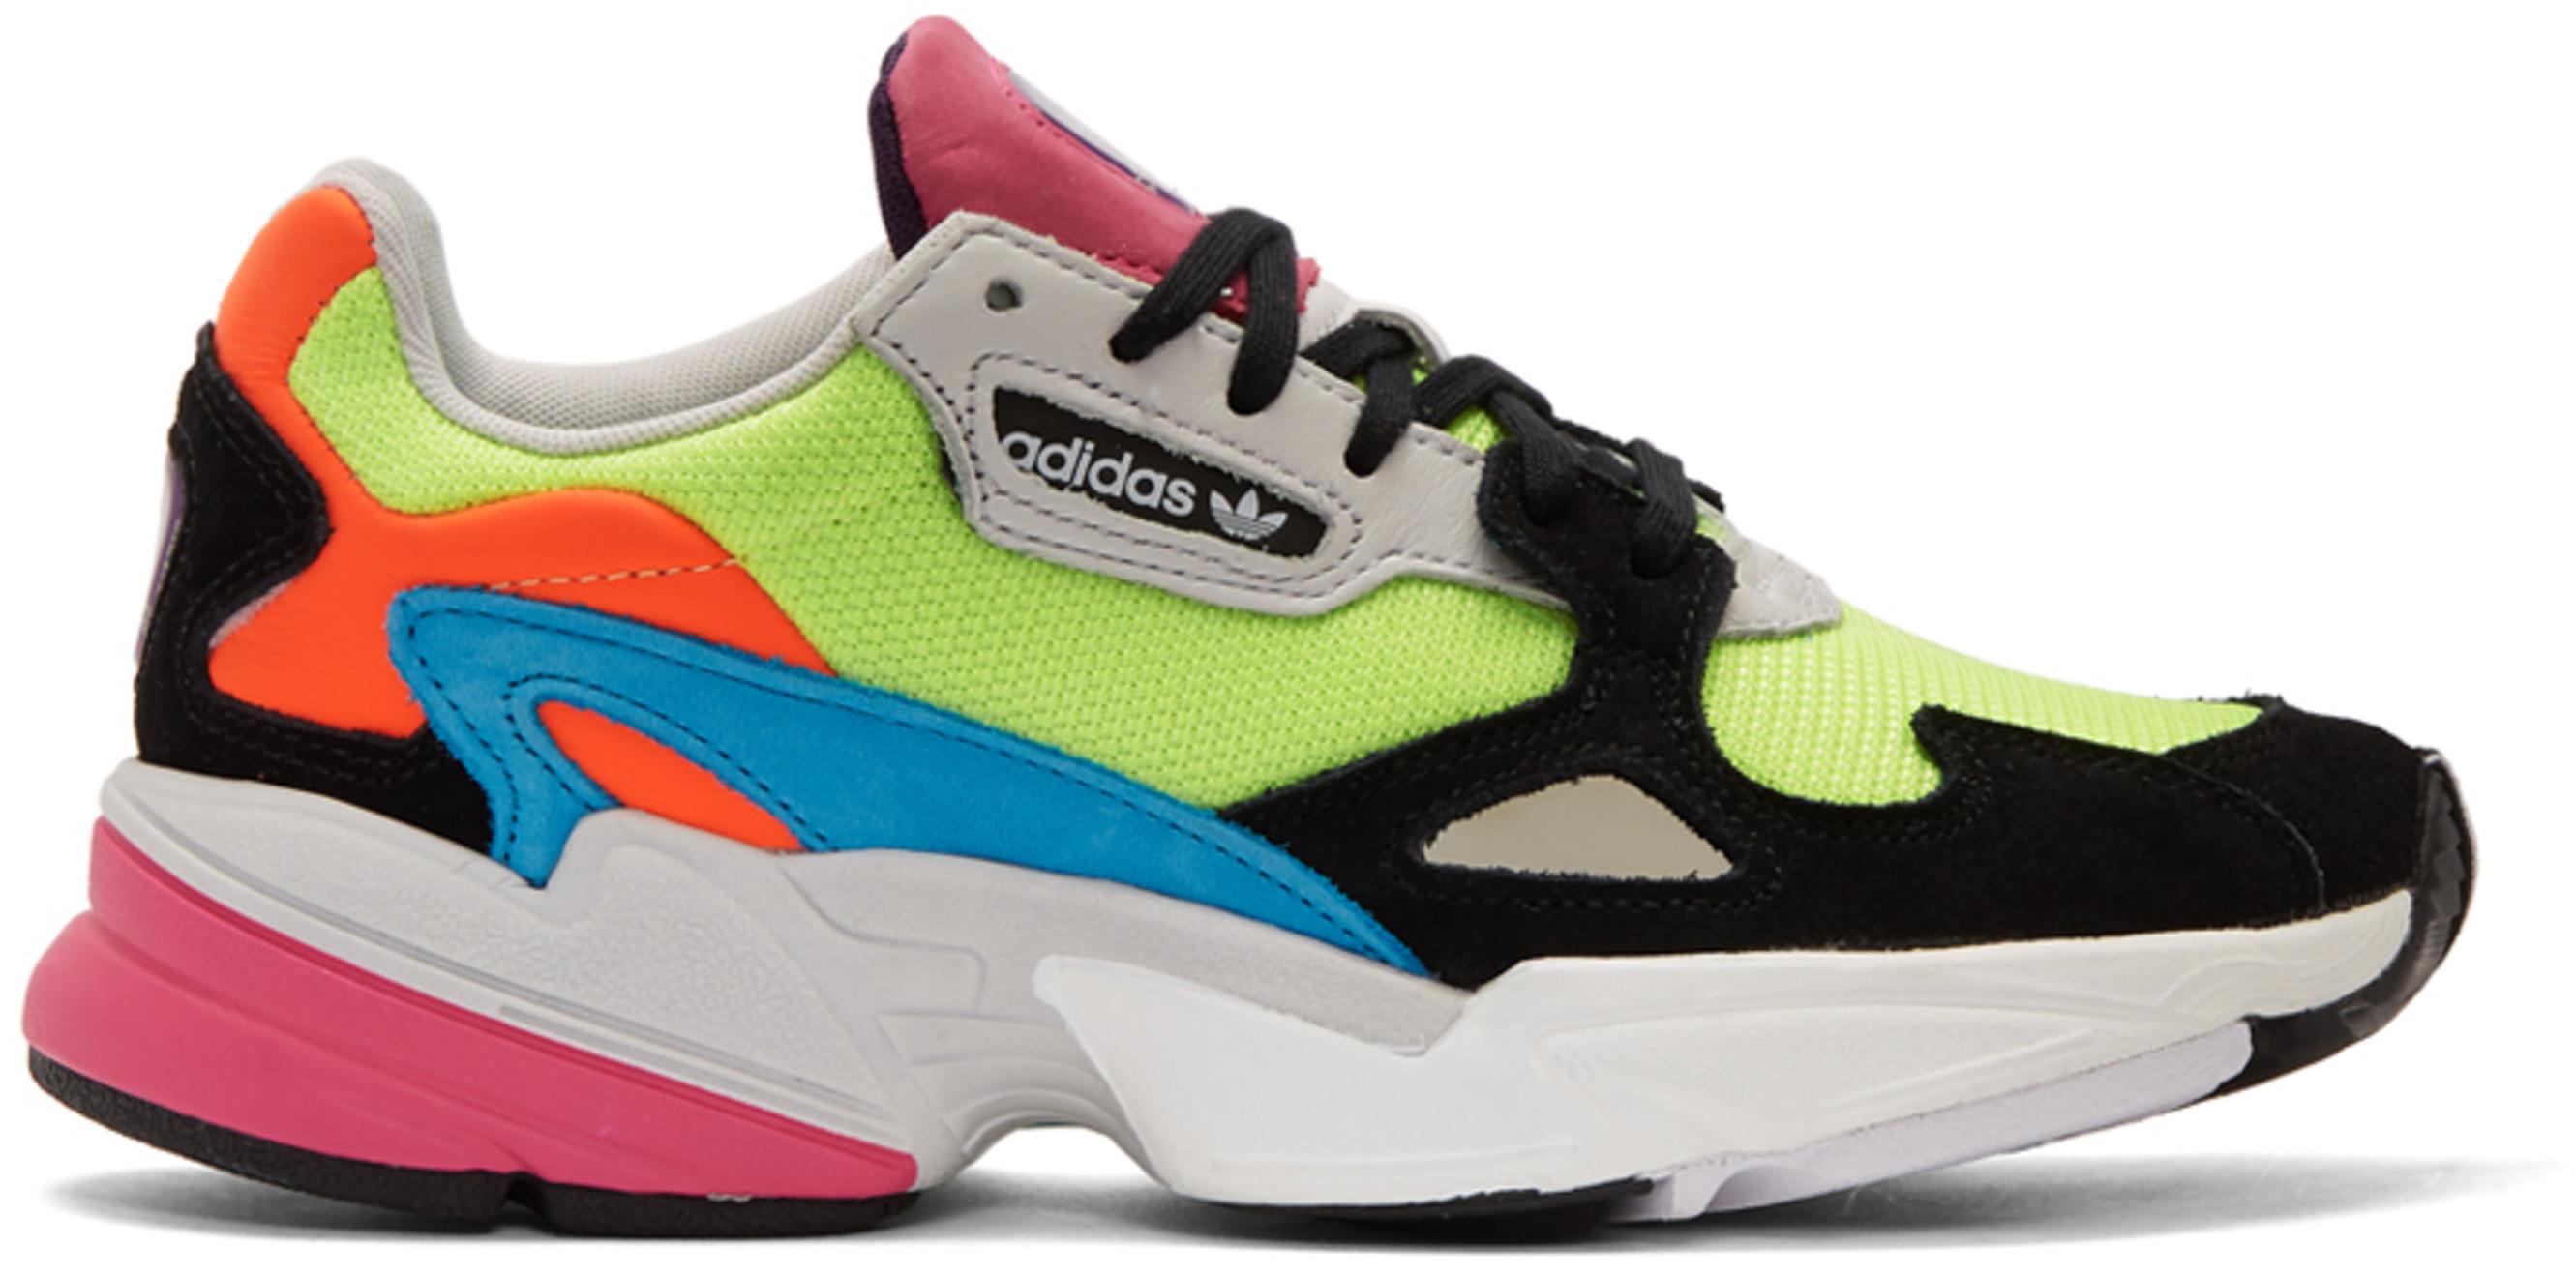 90's Low Sneaker Multicolor Falcon Top 8OPkXnw0